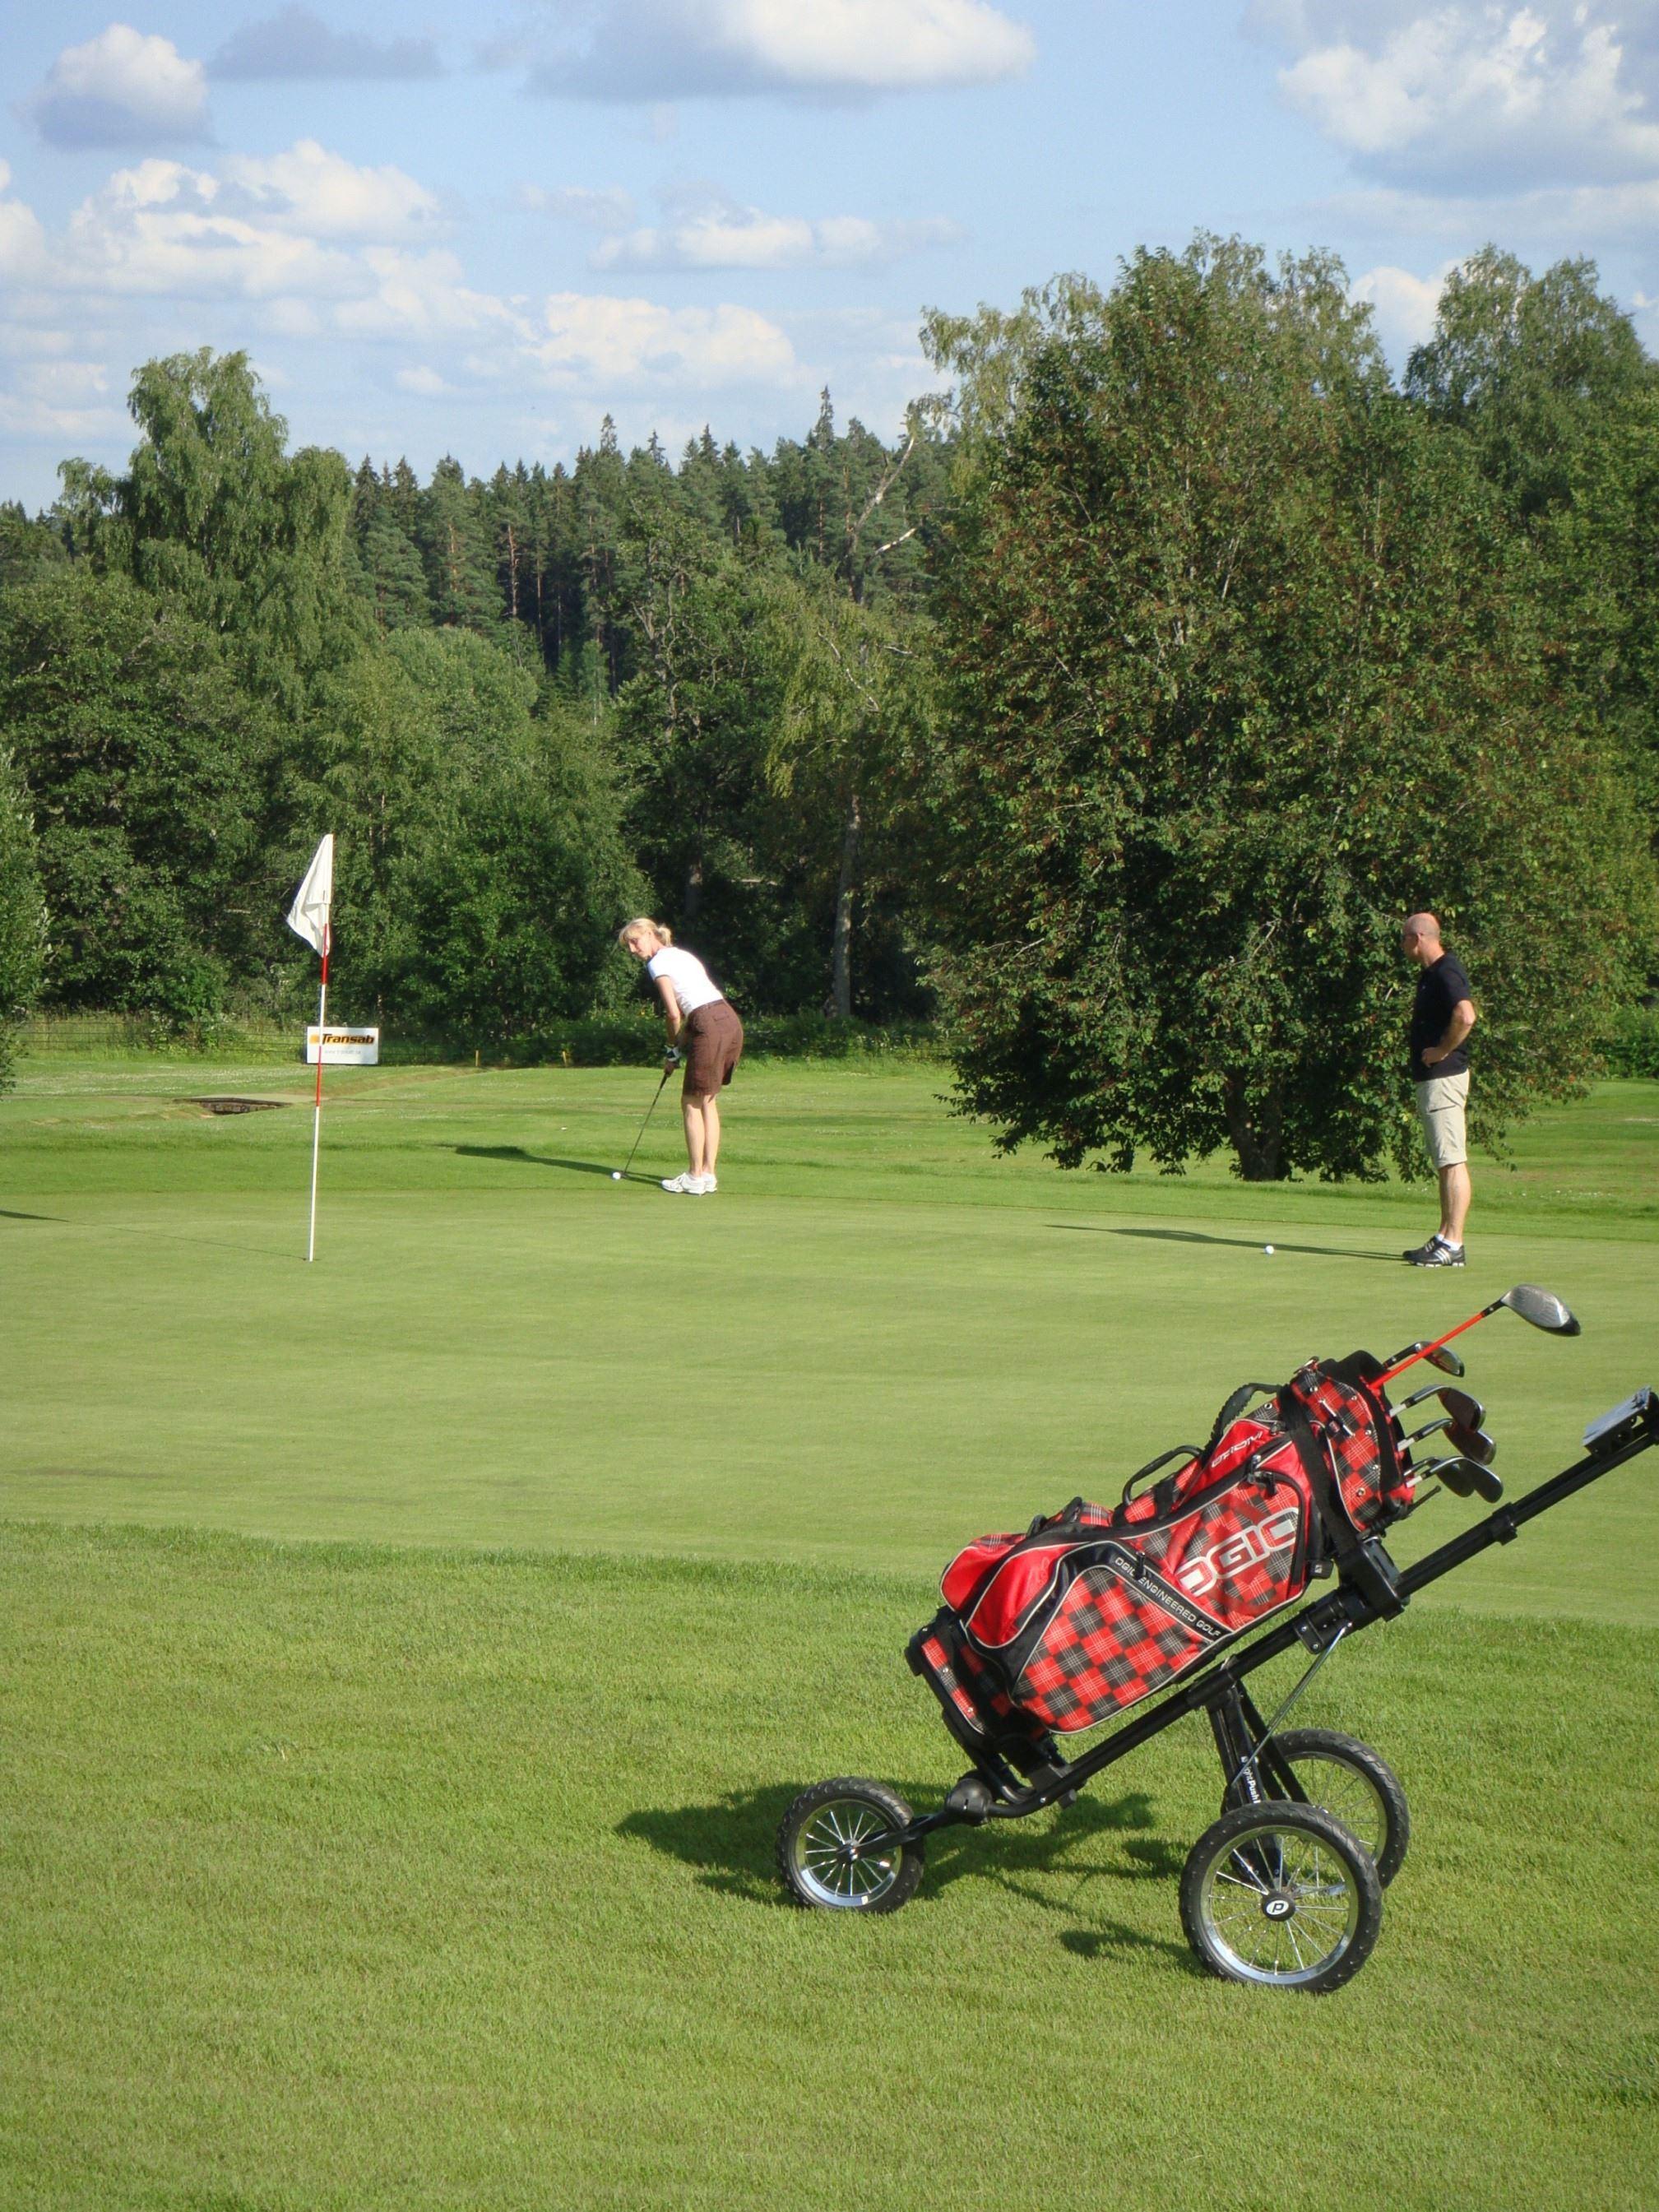 Ryfors Golfklubb